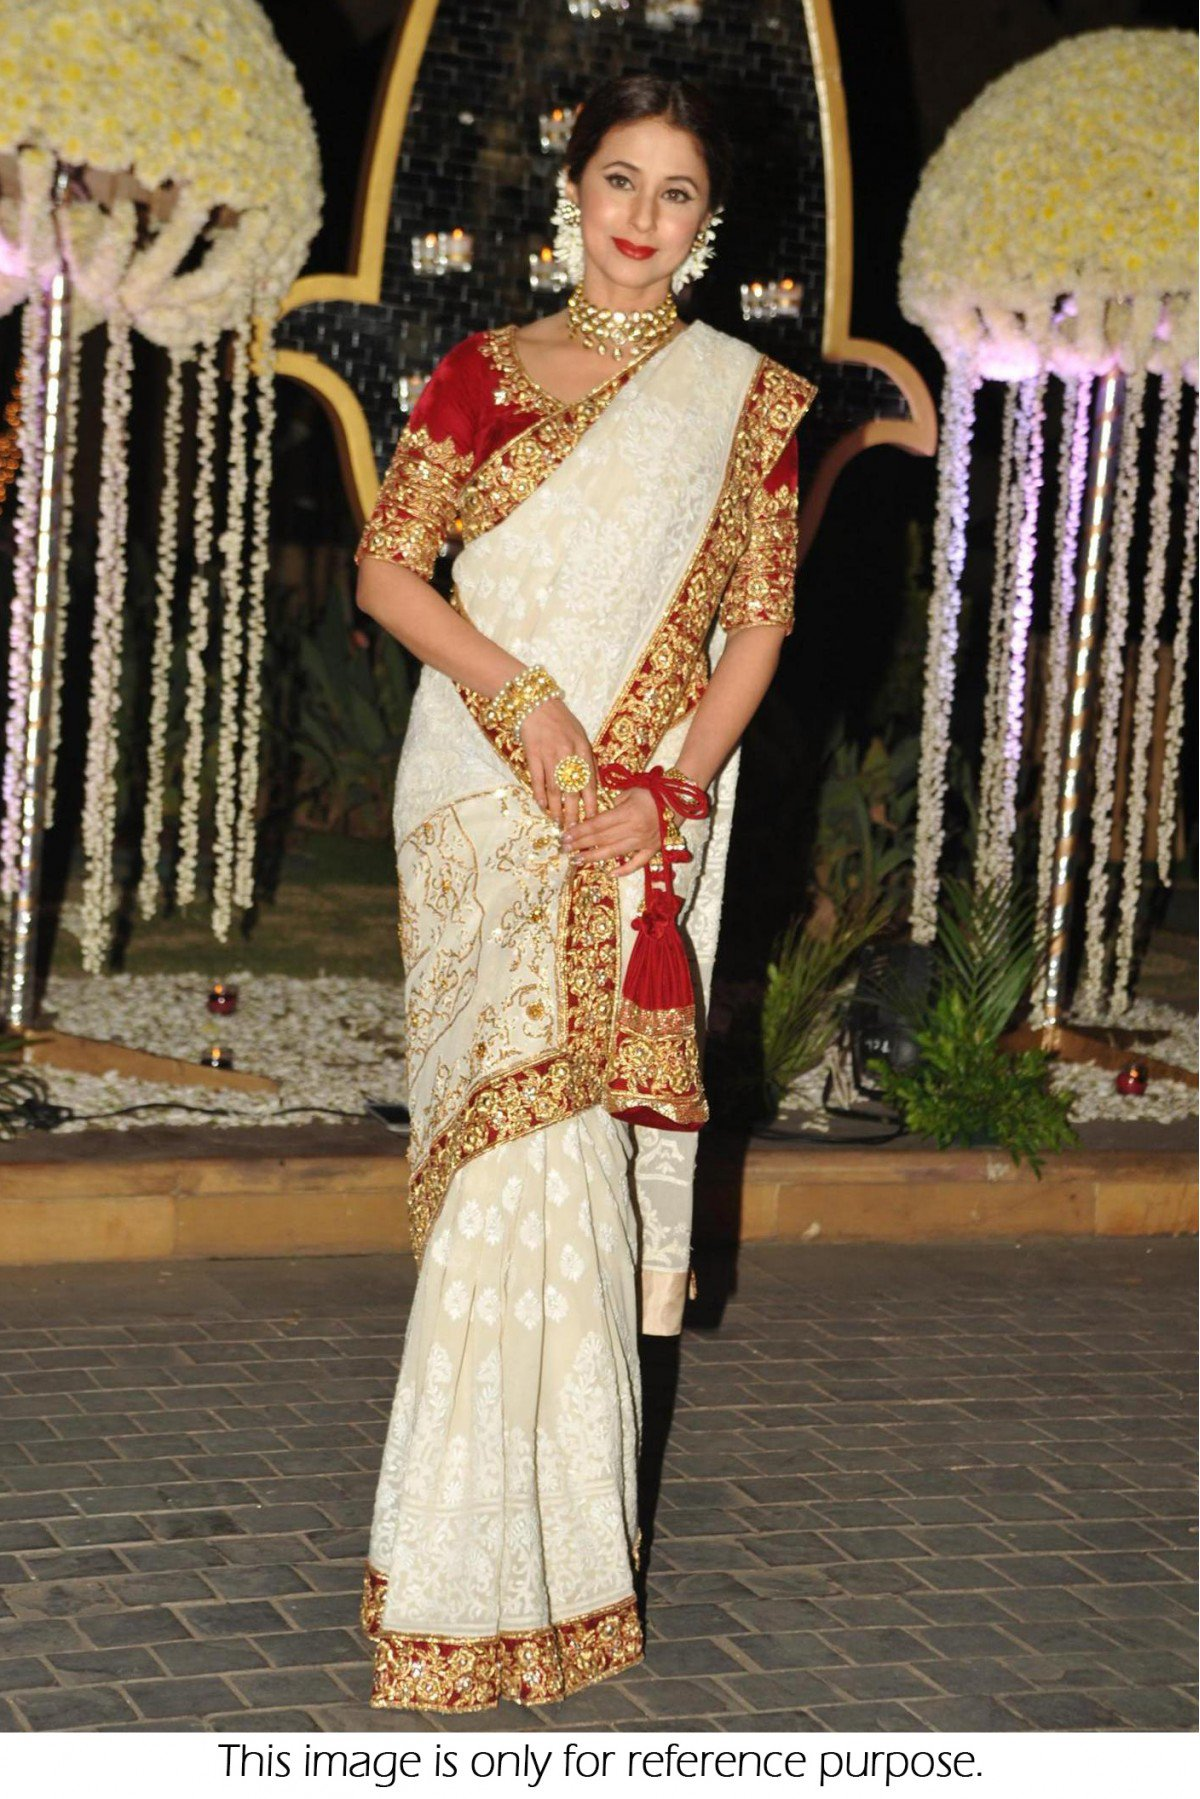 Heres how Ankita Lokhande met her rumoured new flame Urmila matondkar marriage pictures